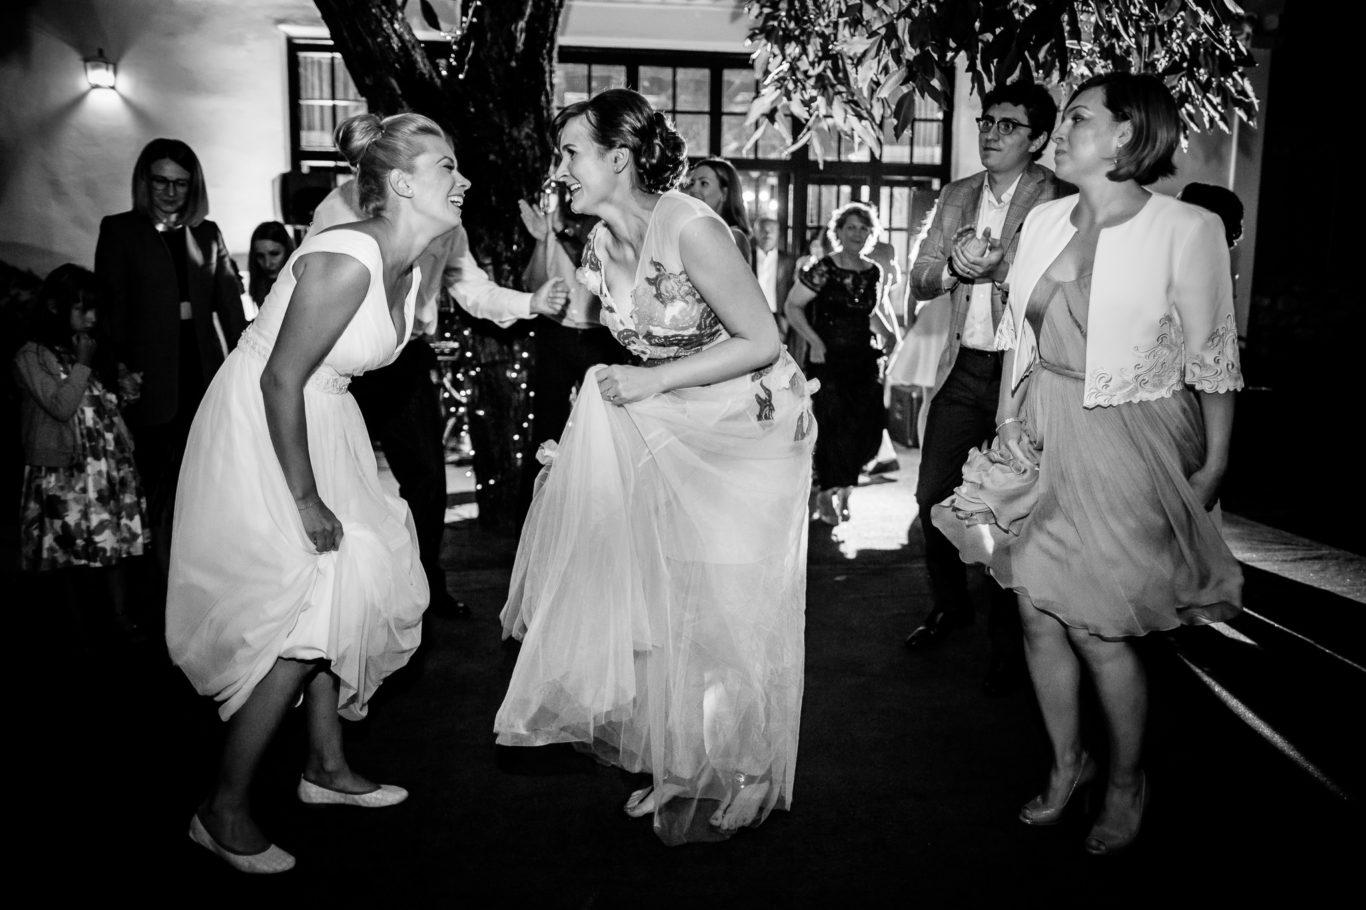 0678-fotoreportaj-nunta-conacul-maldar-cristina-stefan-fotograf-ciprian-dumitrescu-dc1_3102